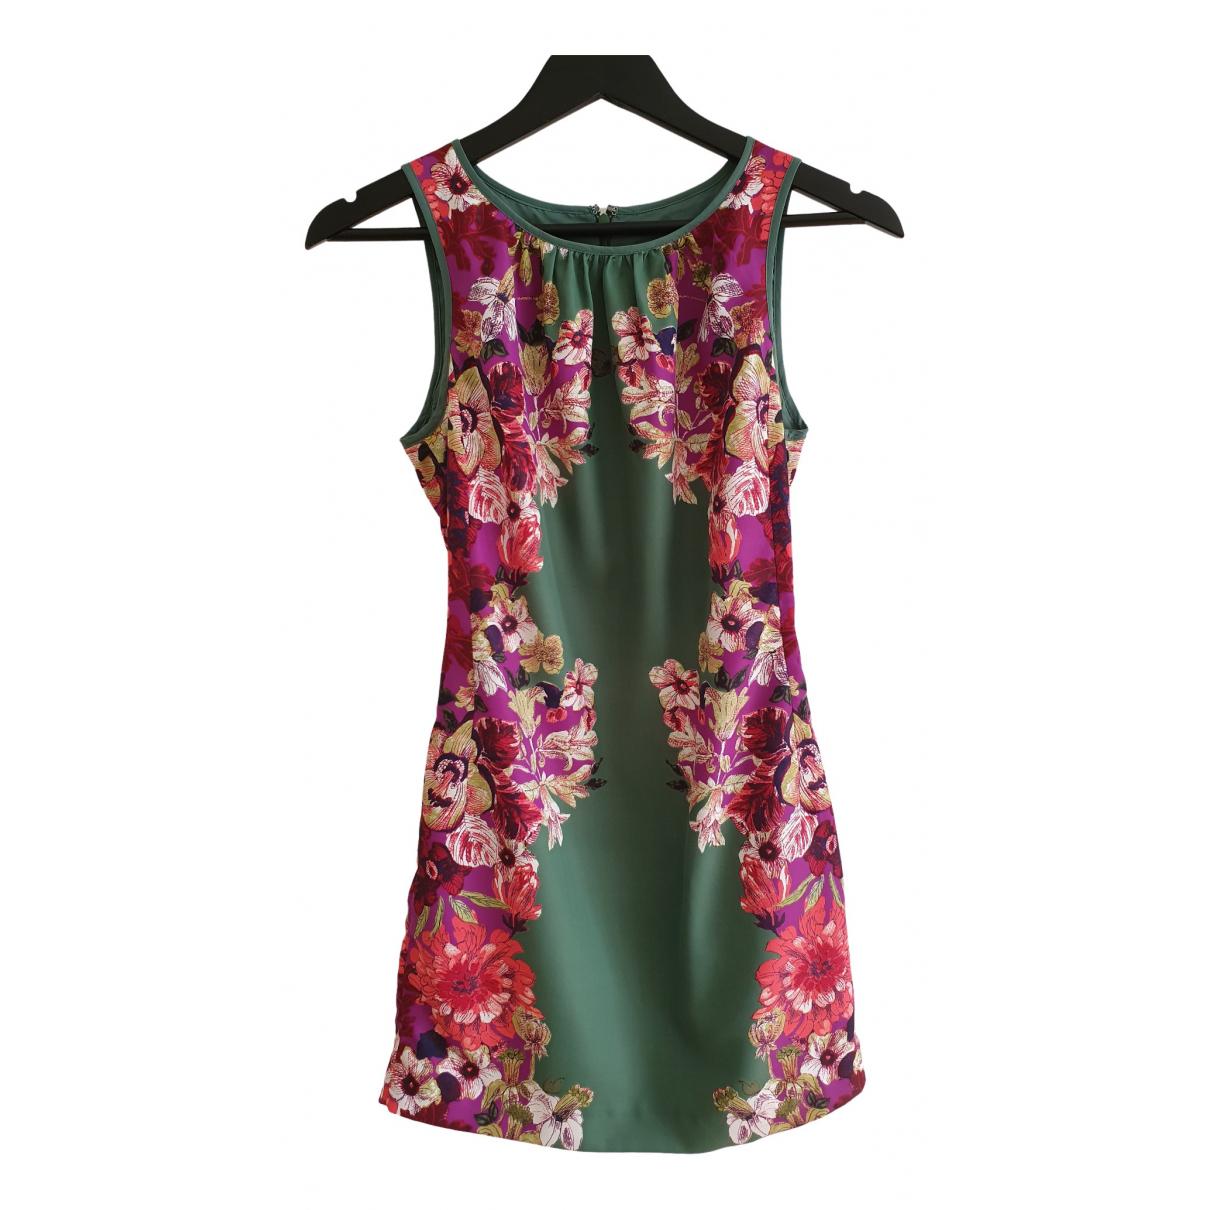 Ann Taylor \N Green dress for Women 36 FR